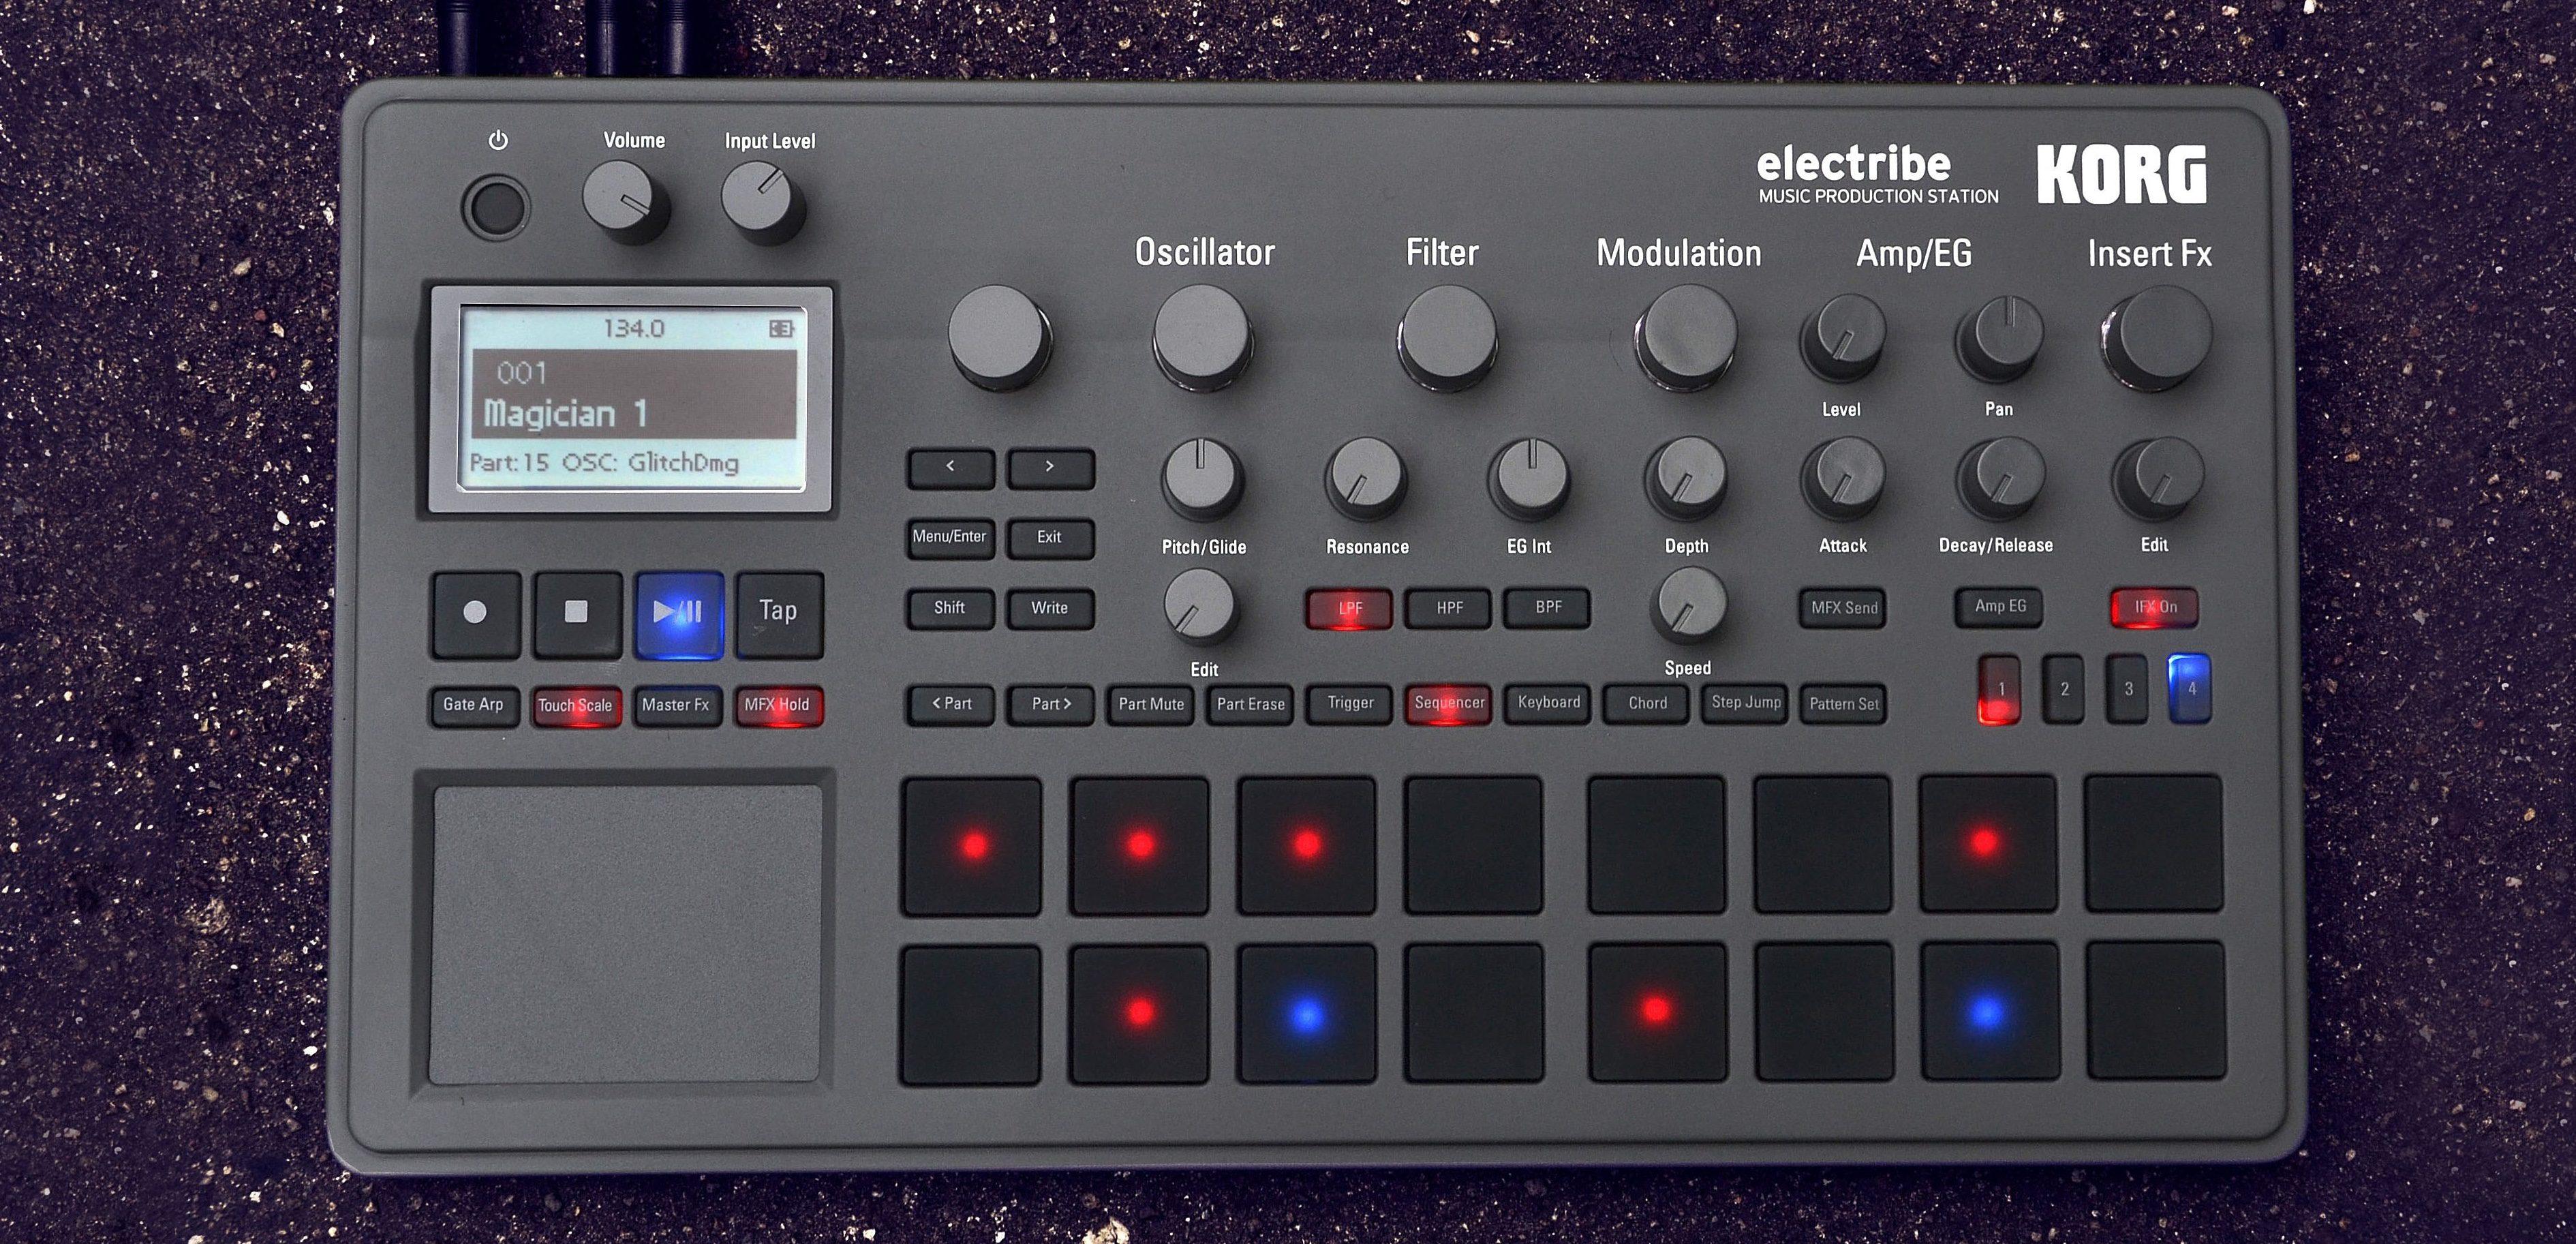 Korg - Electribe